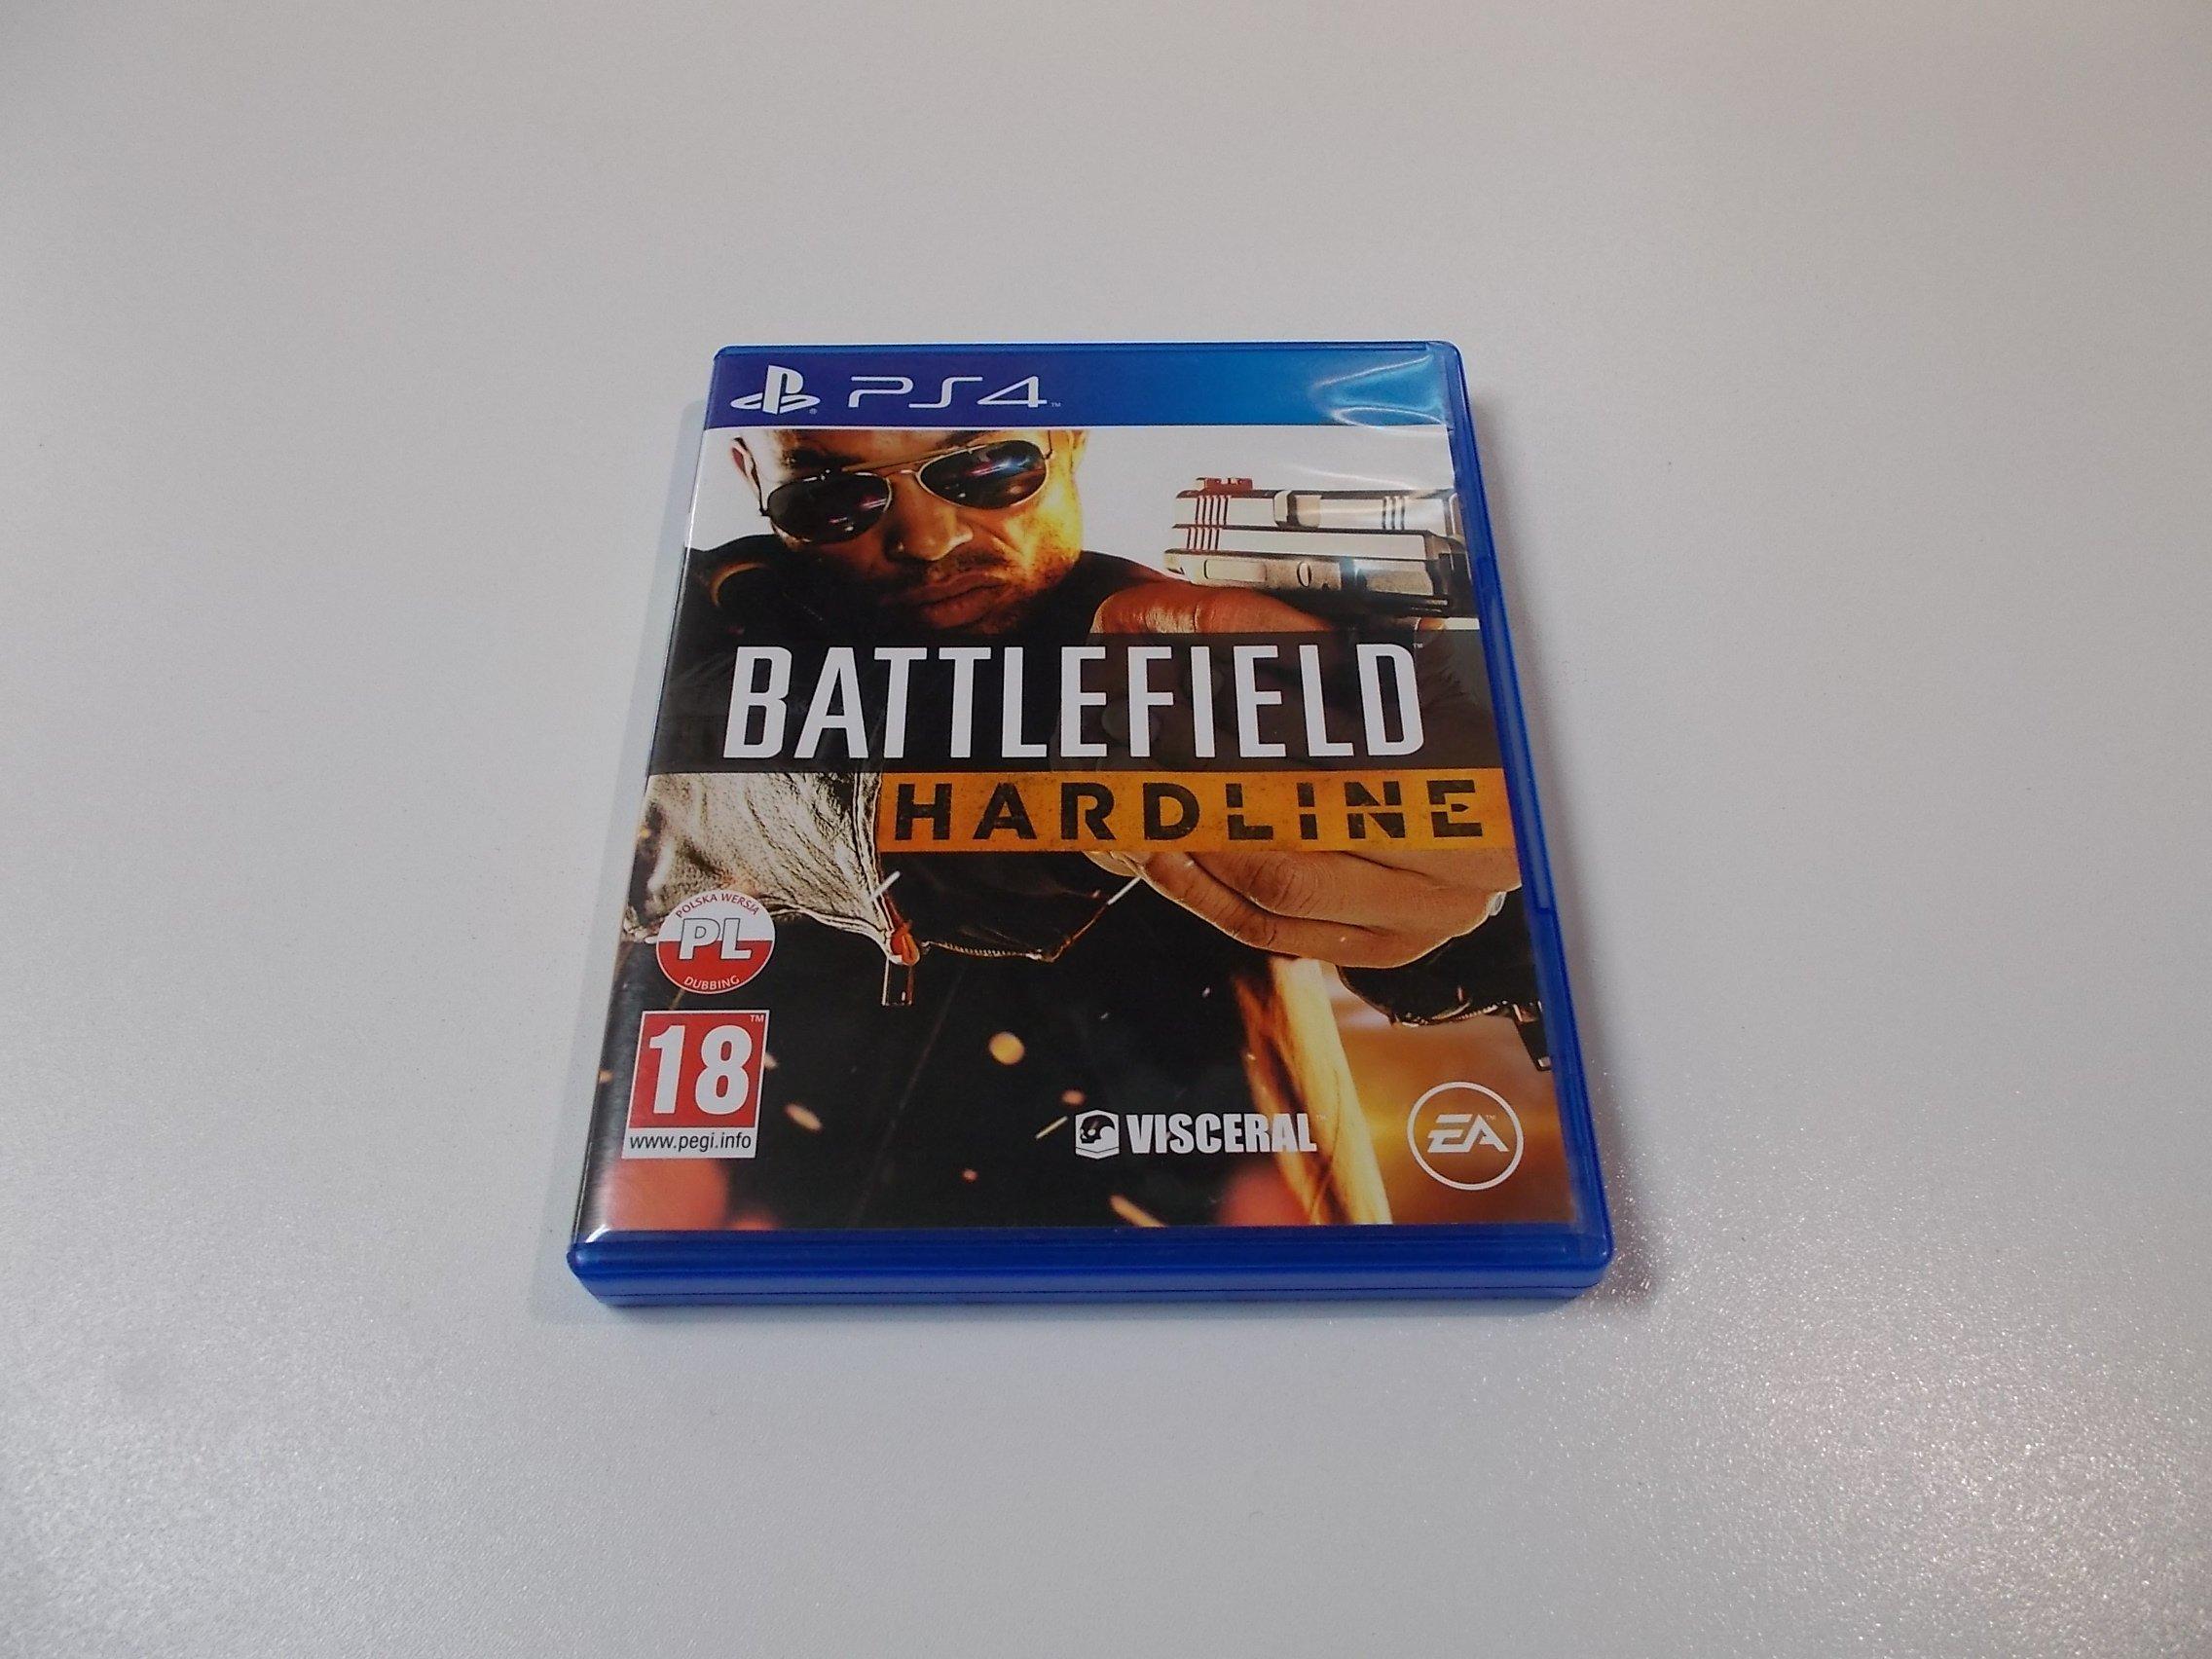 Battlefield Hardline - GRA Ps4 - Opole 0429